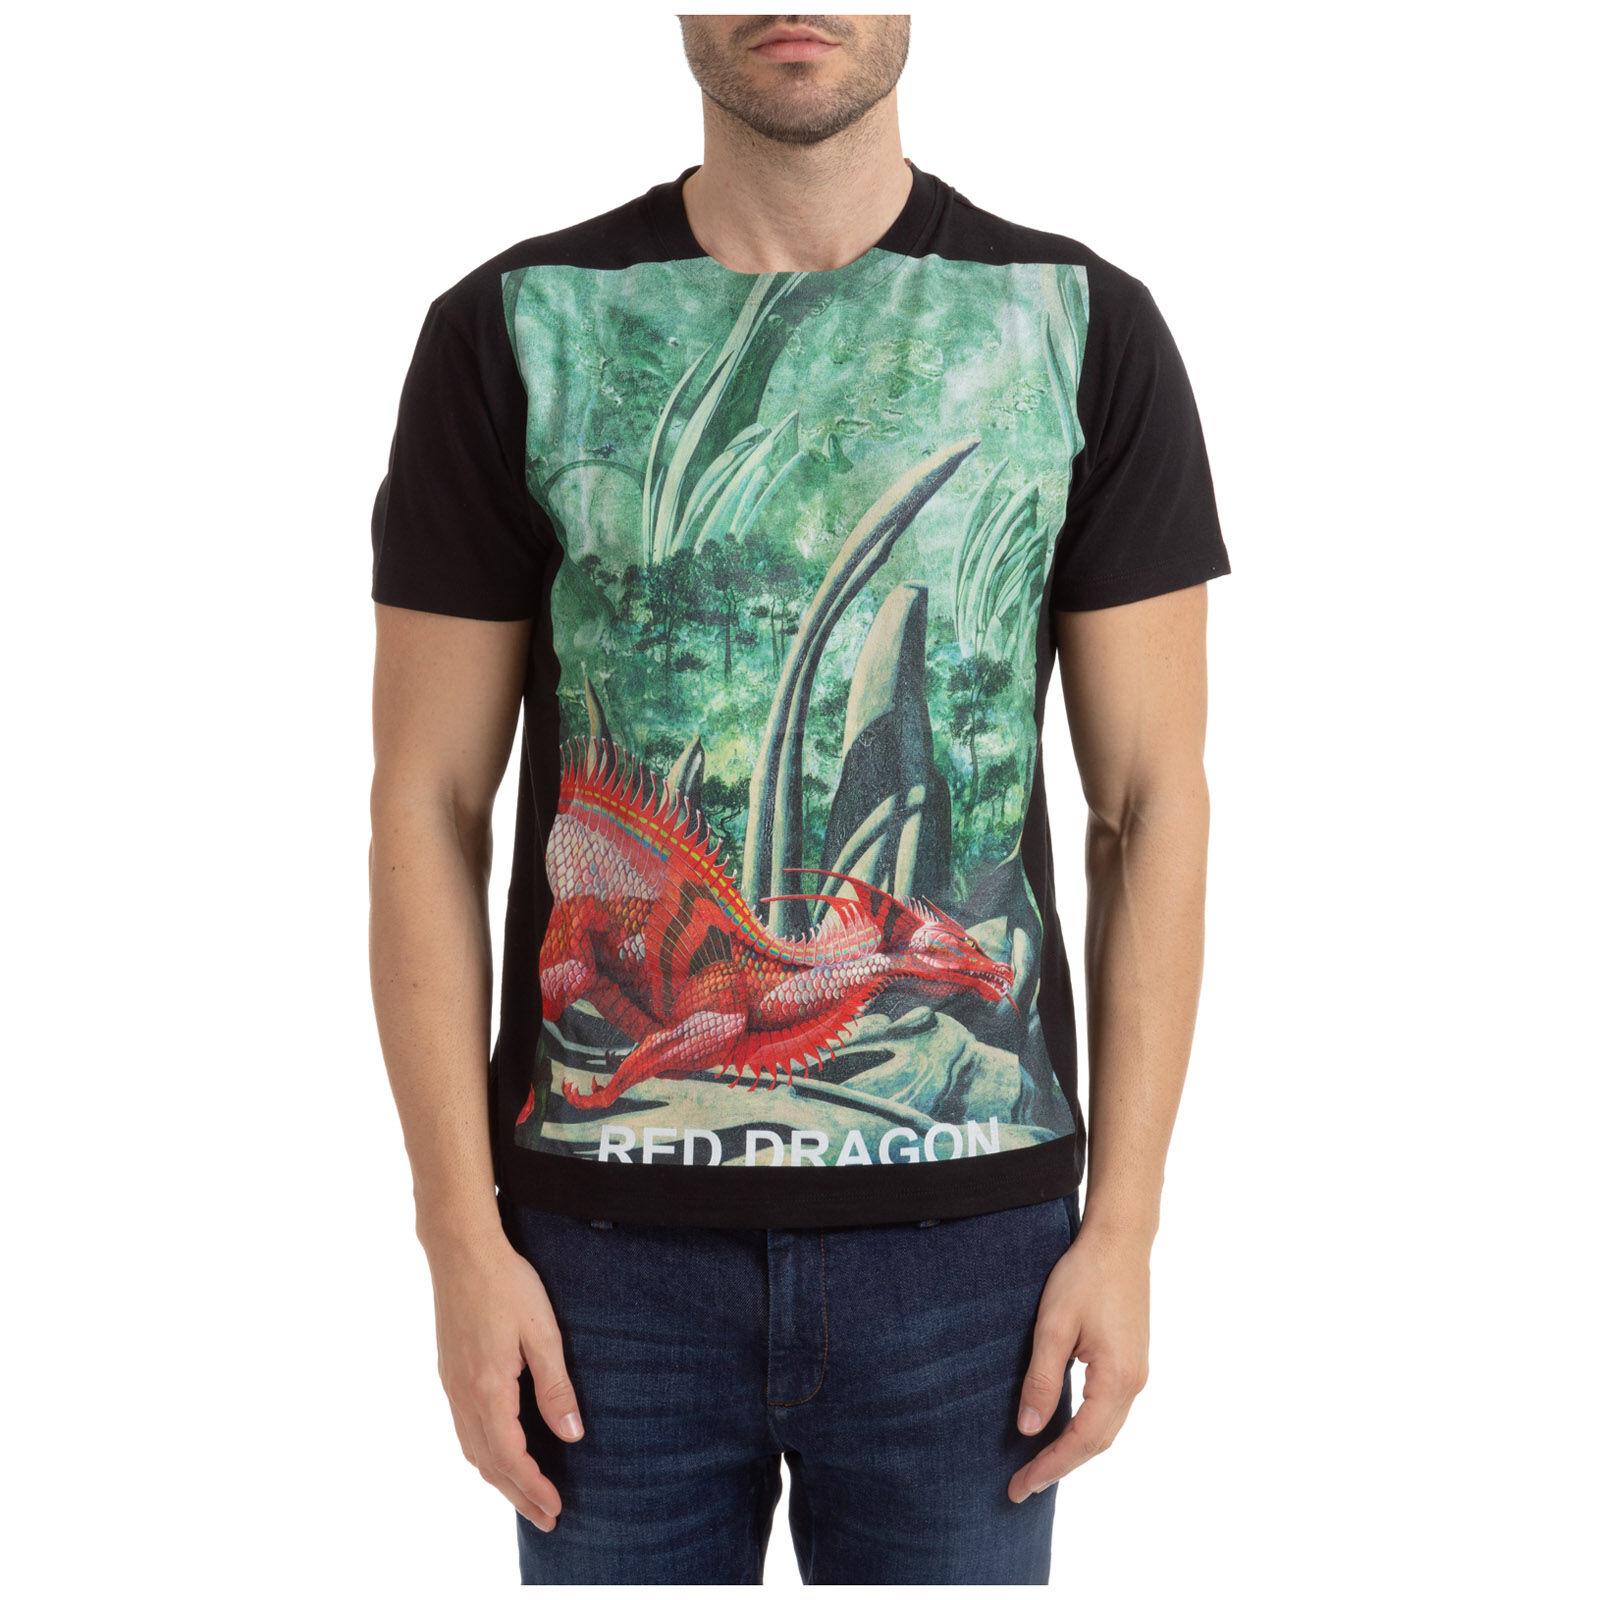 Valentino Men's short sleeve t-shirt crew neckline jumper dragons garden  - Black - Size: Small